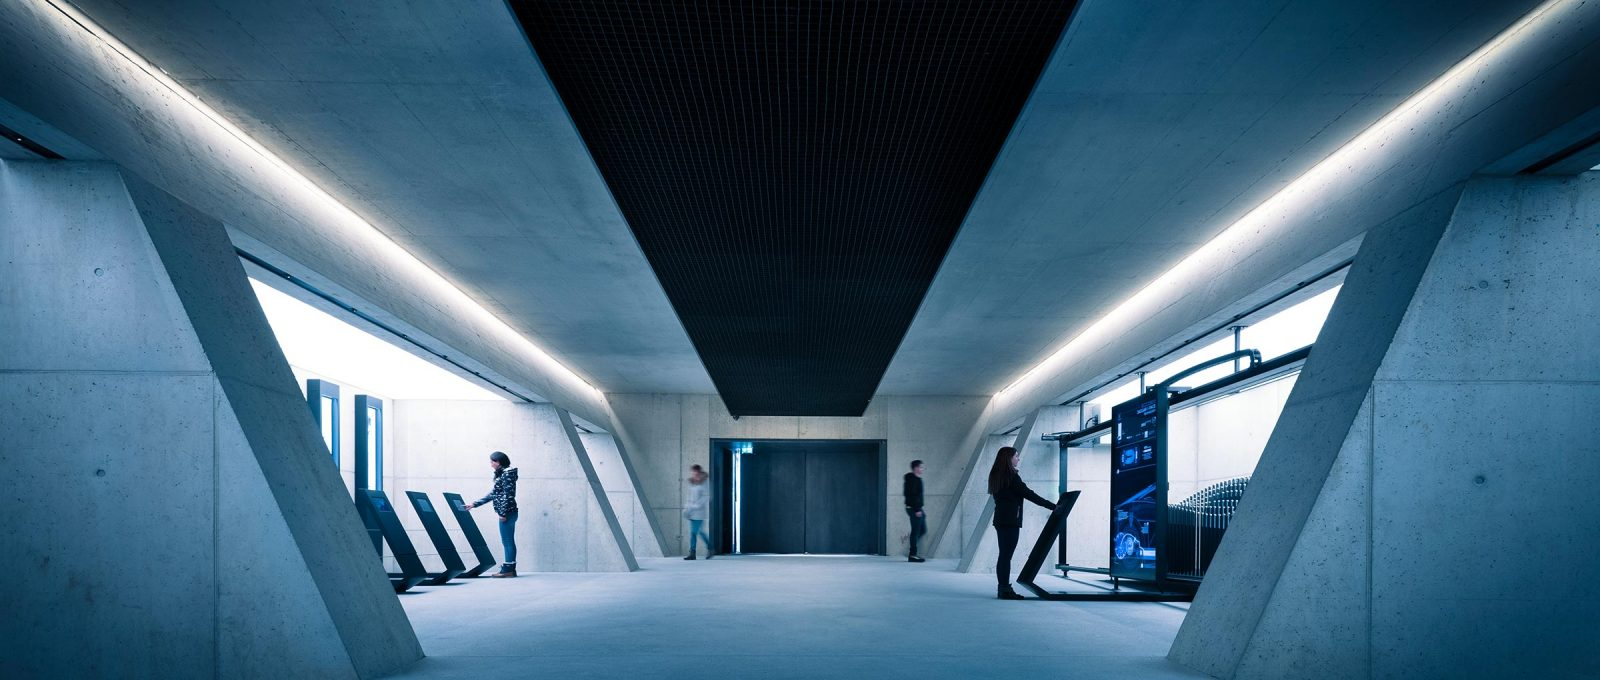 007 Elements, un'installazione dedicata a James Bond